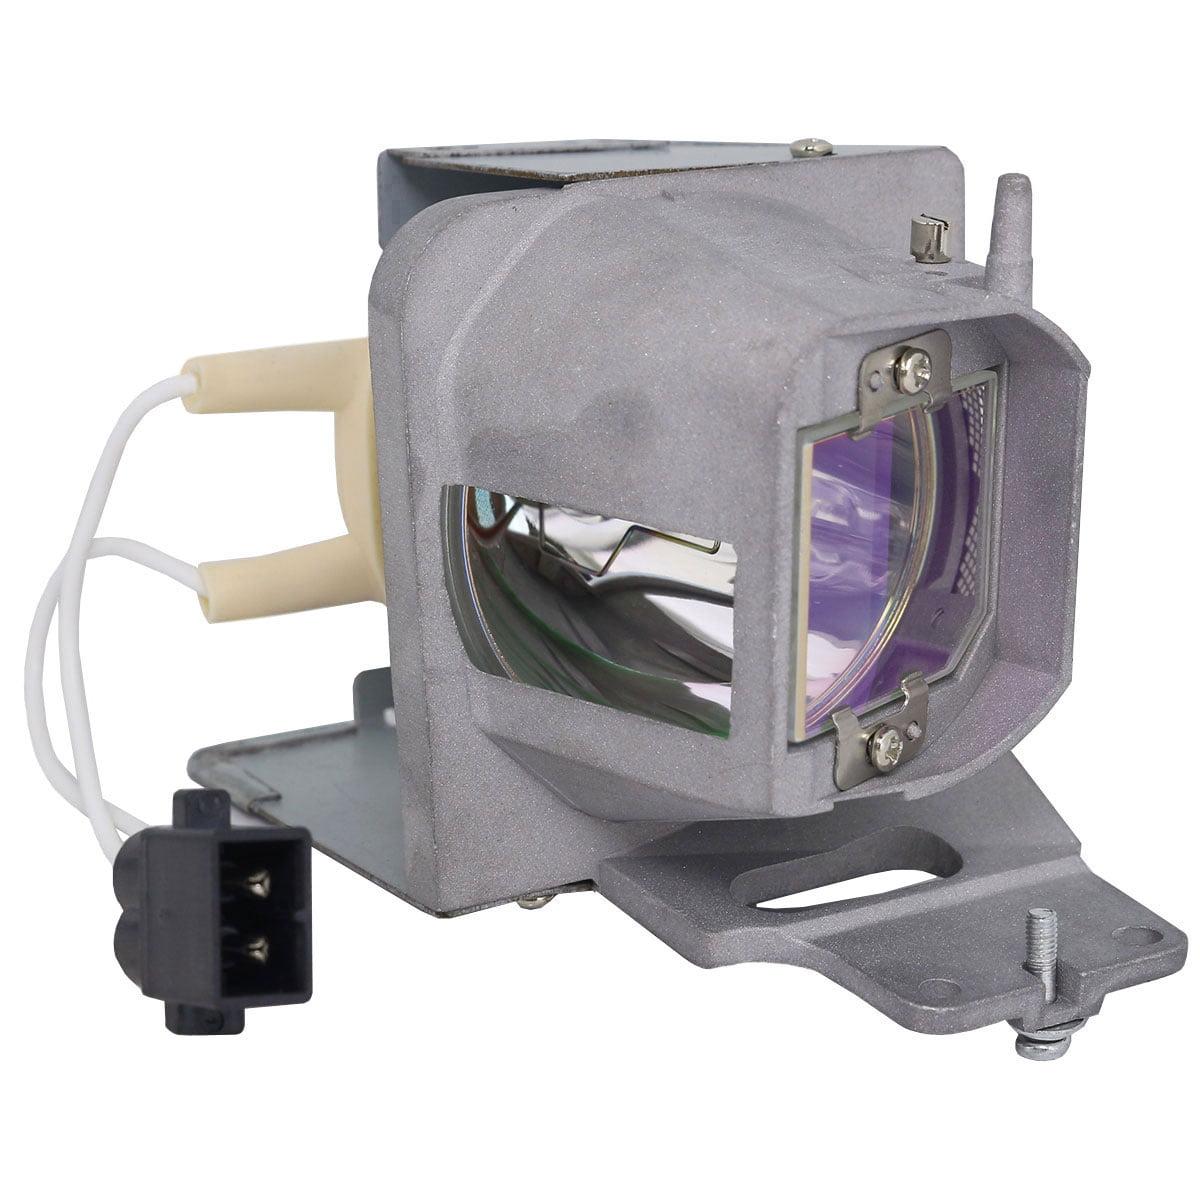 Lutema Platinum for Acer MR.JJU11.002 Projector Lamp (Original Philips Bulb) - image 4 de 5